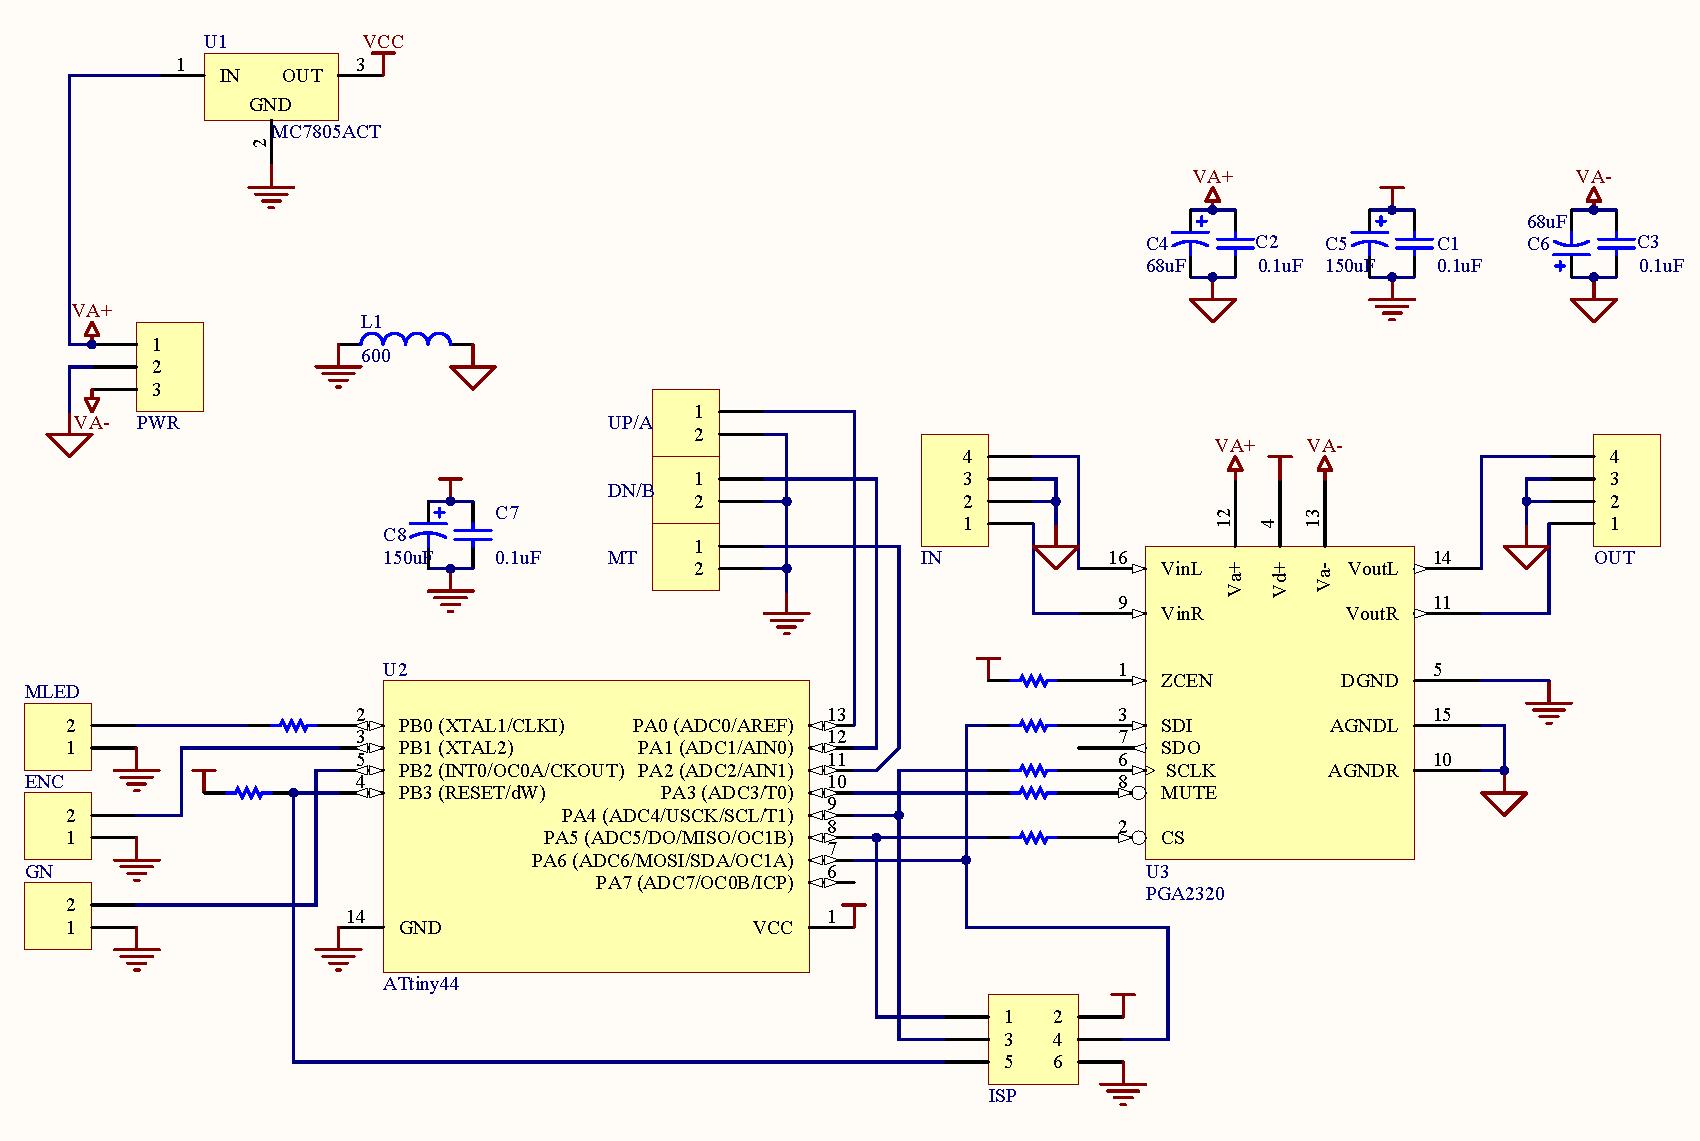 volume control wiring diagram peptide structure simple gt circuits minivol pga2320 l21252 next gr